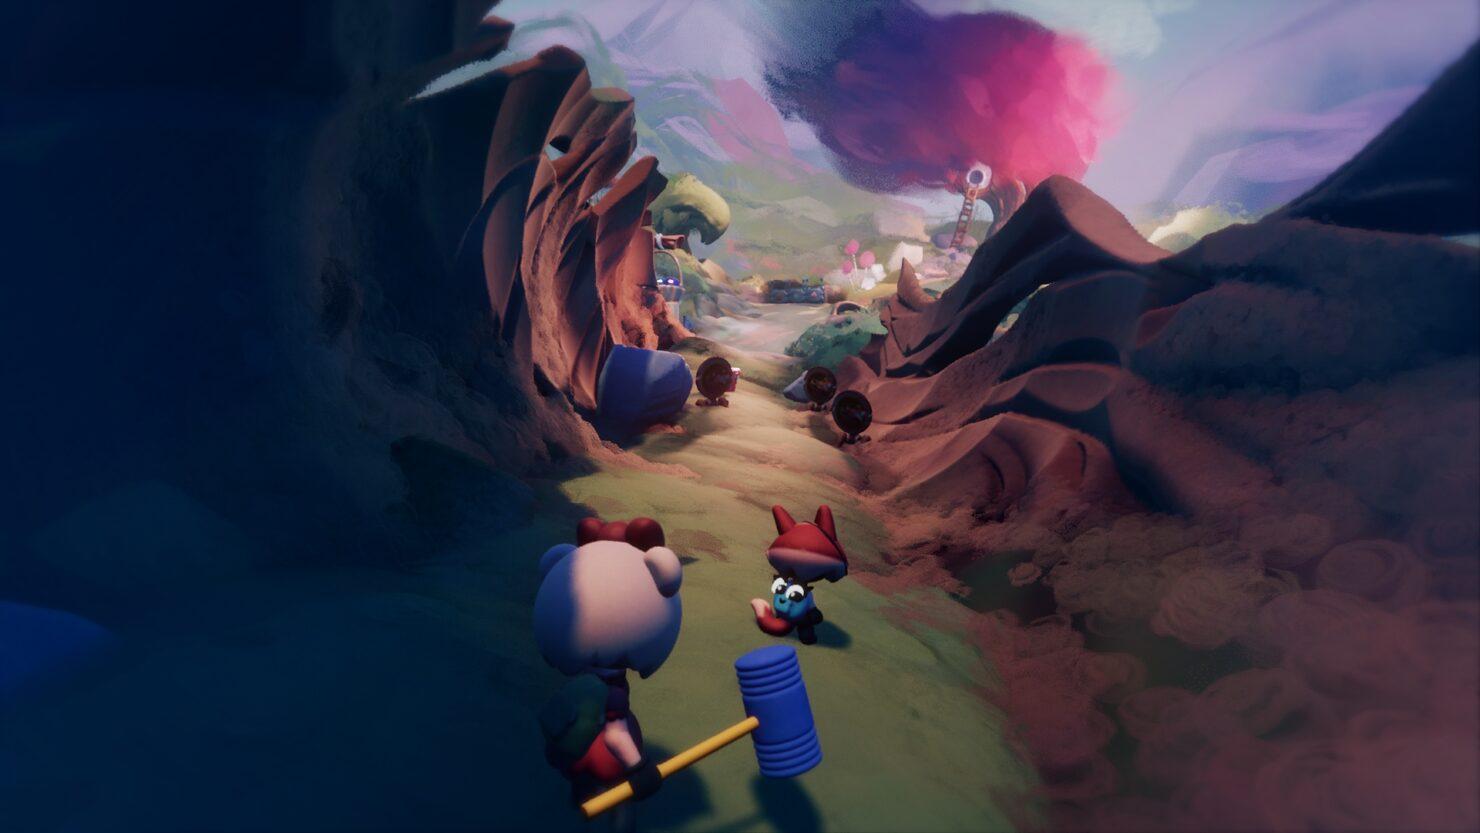 dreams-ps4-psx17-screenshot-08-childhood